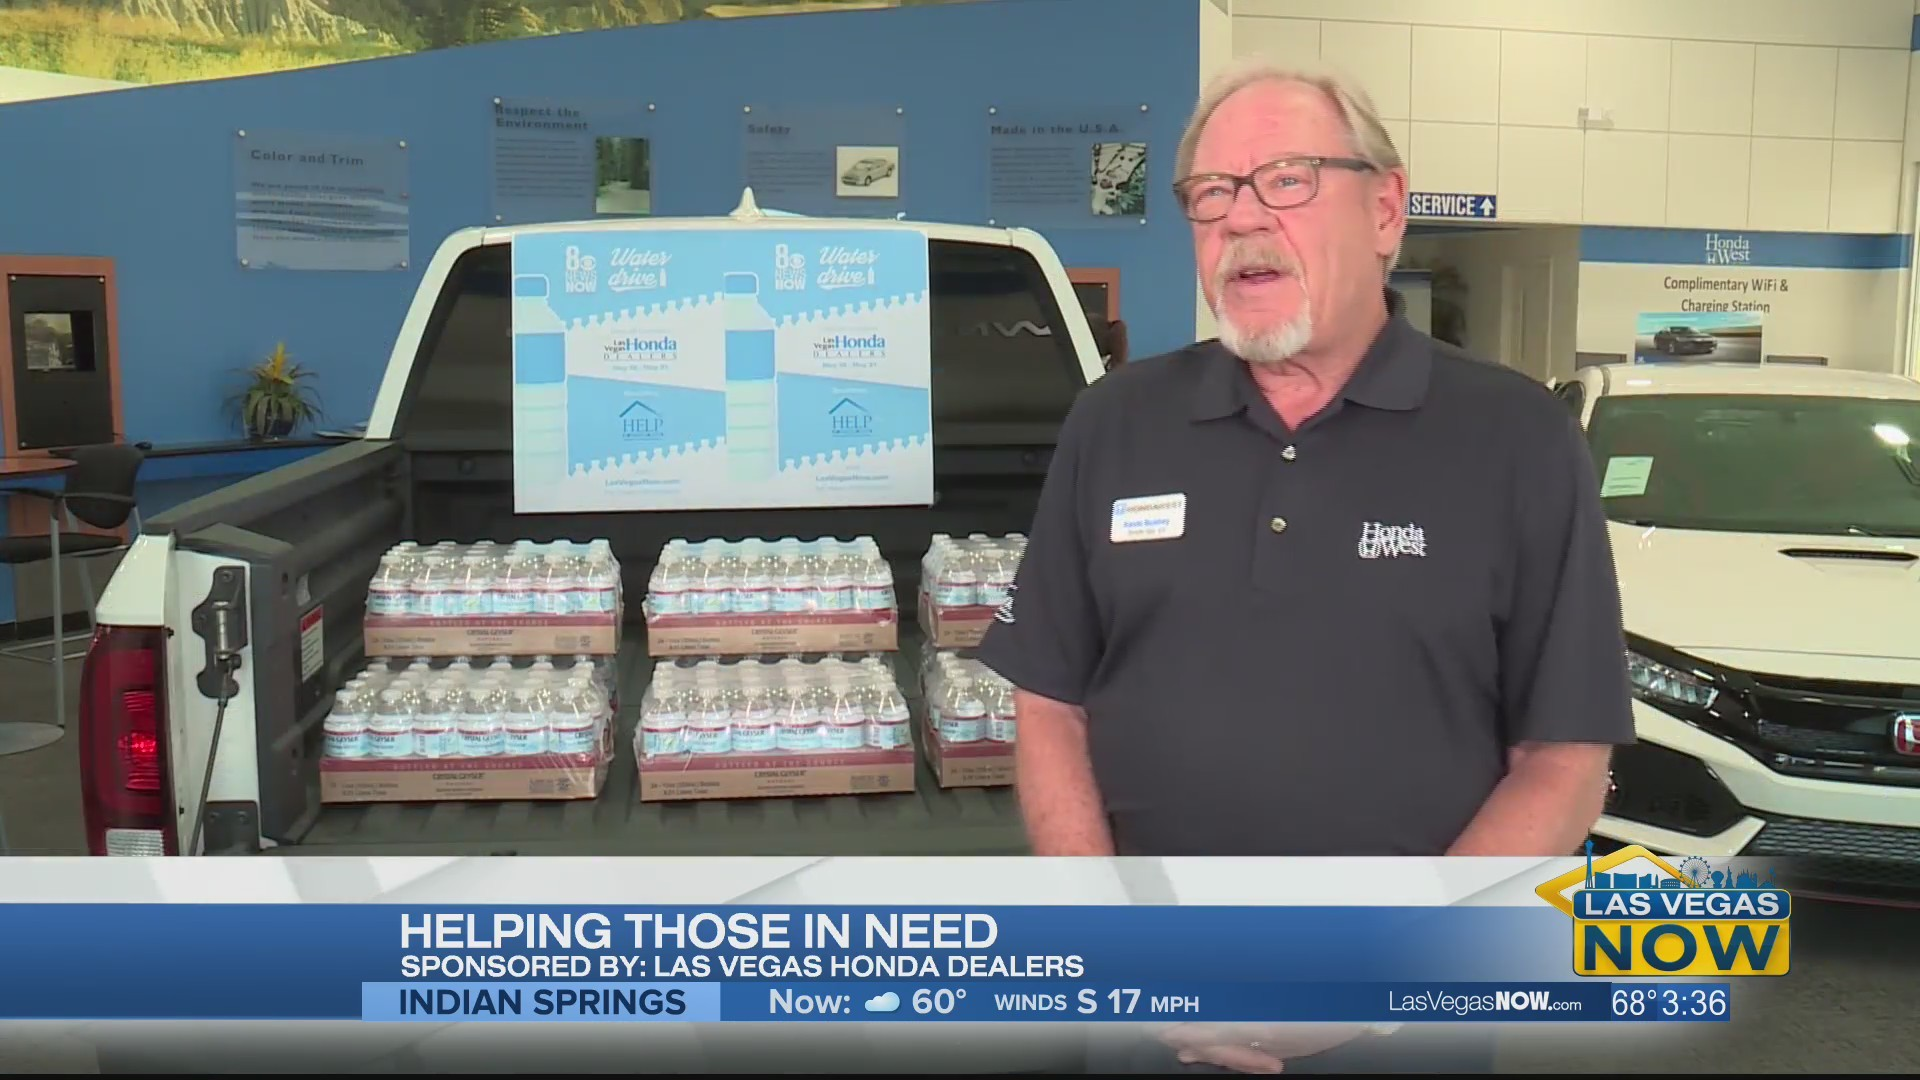 Las Vegas Honda Dealers are helping those in need